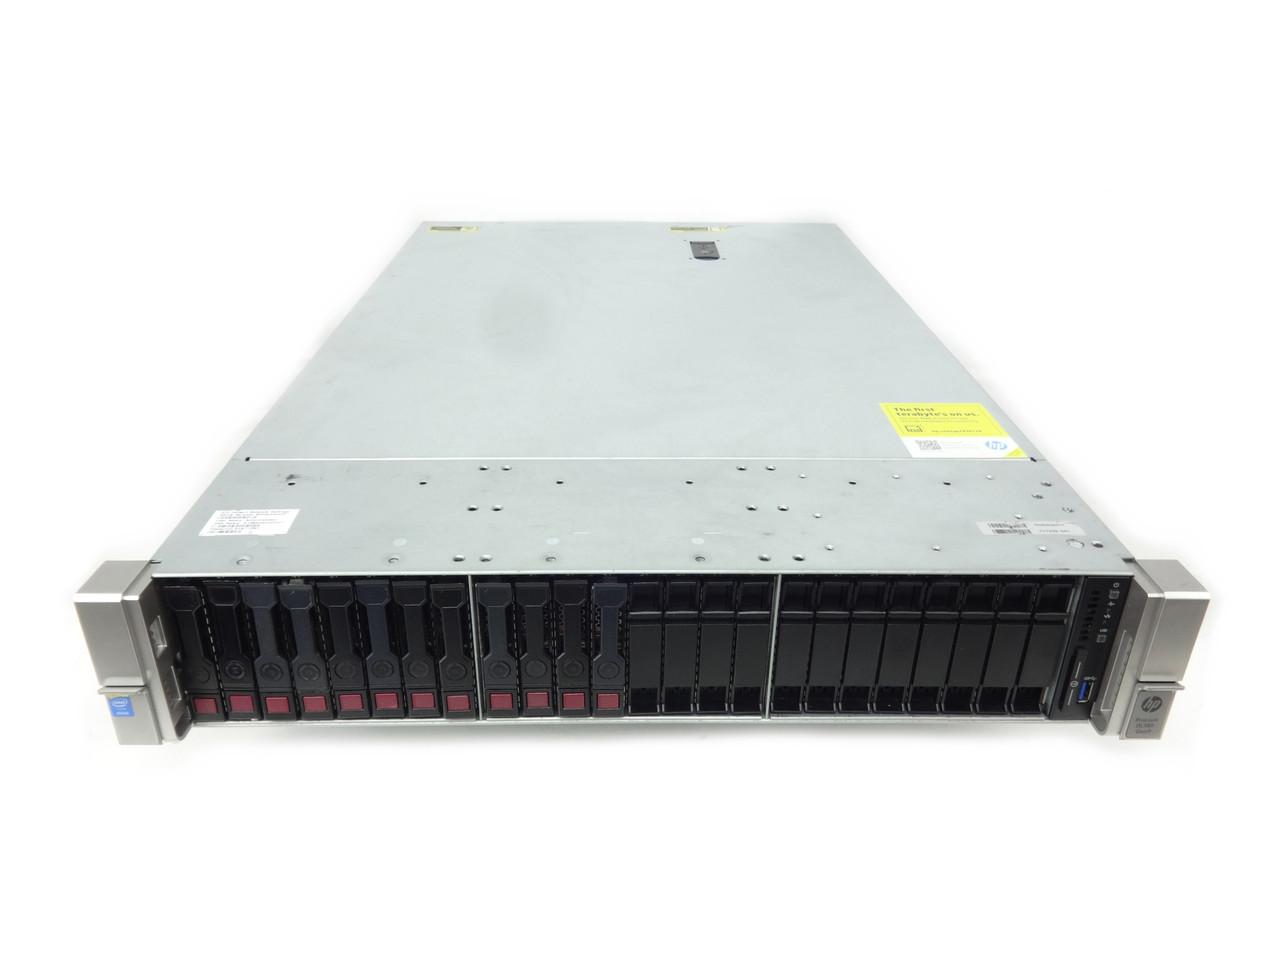 HPEProliant DL380 Gen9 Server